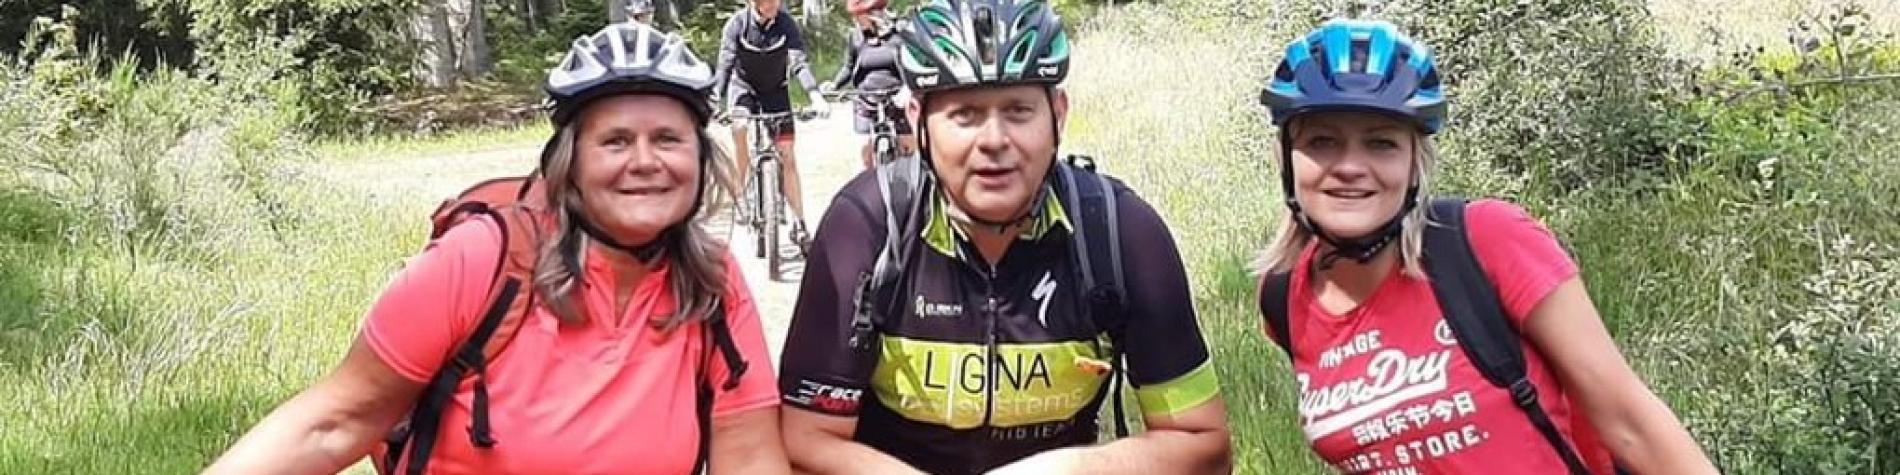 E-mountain bike - Malmedy